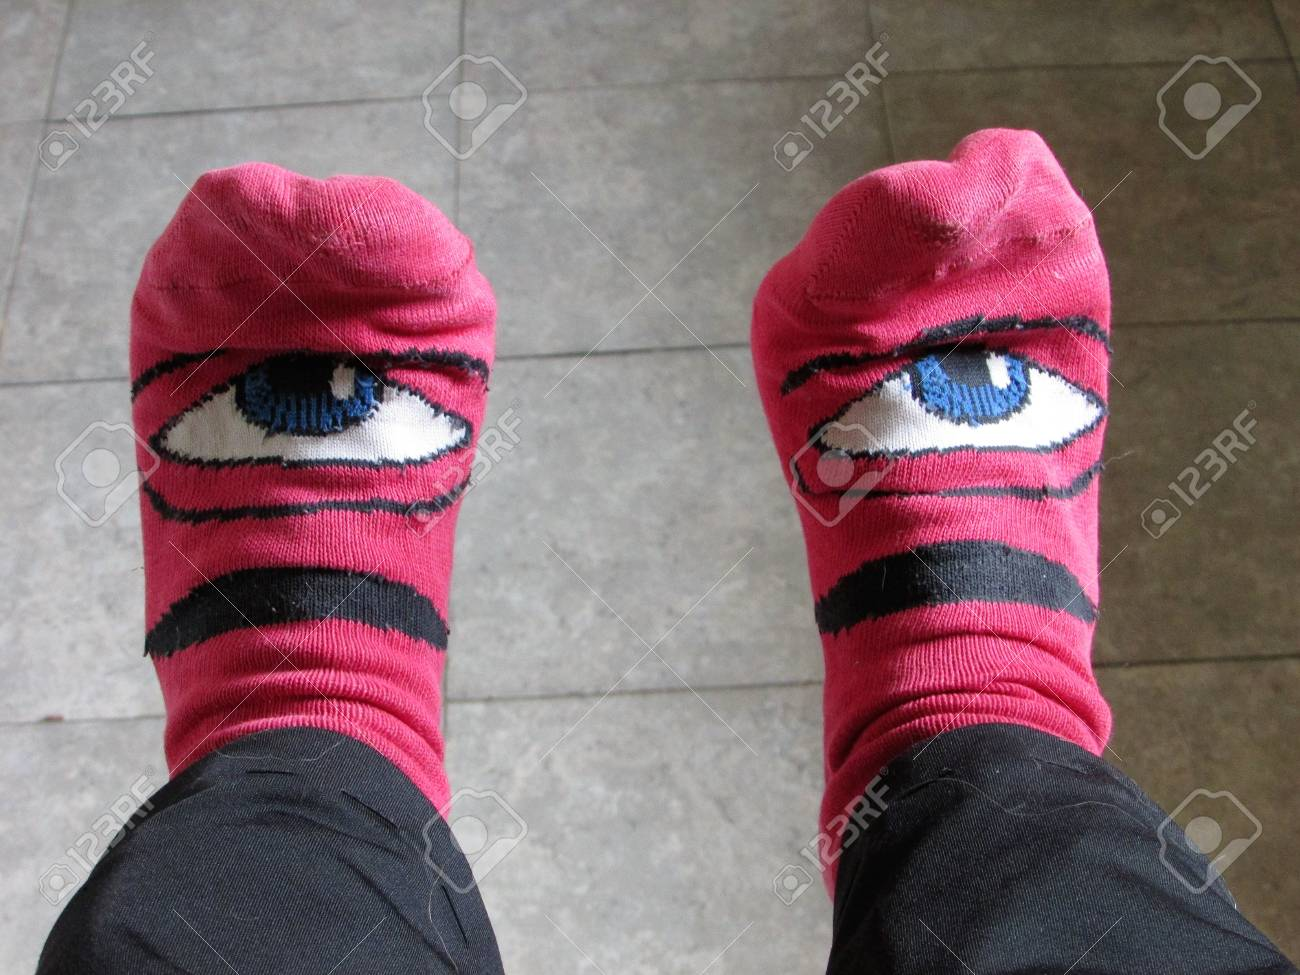 35ede2cf528 feet   socks Stock Photo - 86500933